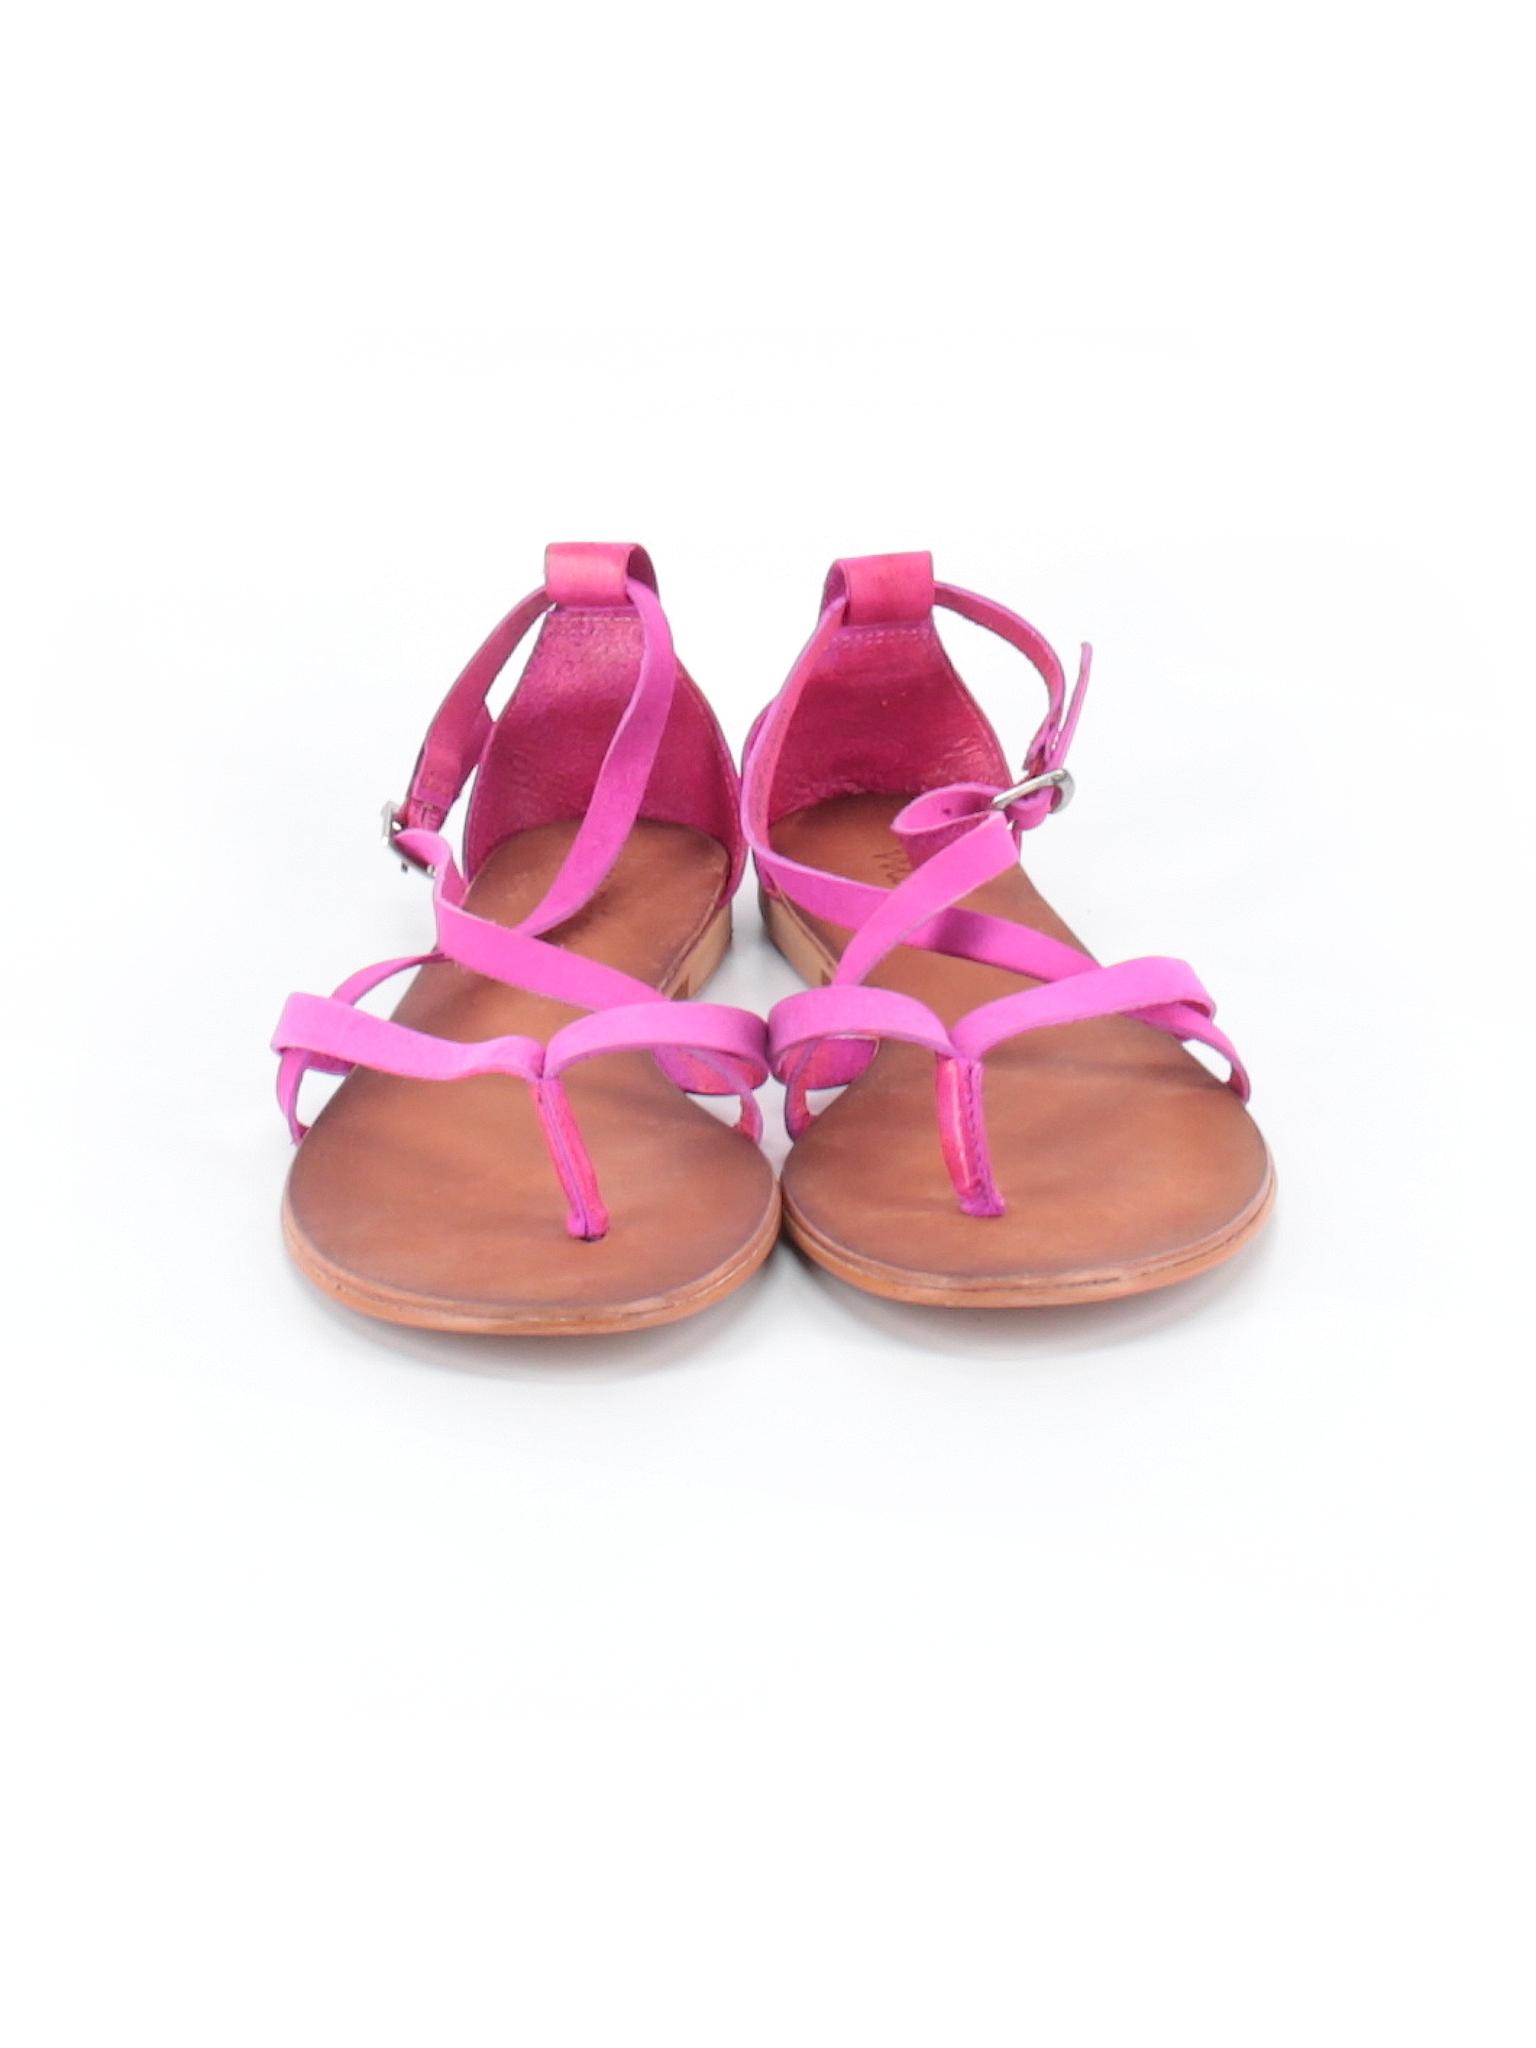 Sandals Boutique Matisse Matisse promotion promotion Sandals Boutique Boutique Hqxw40